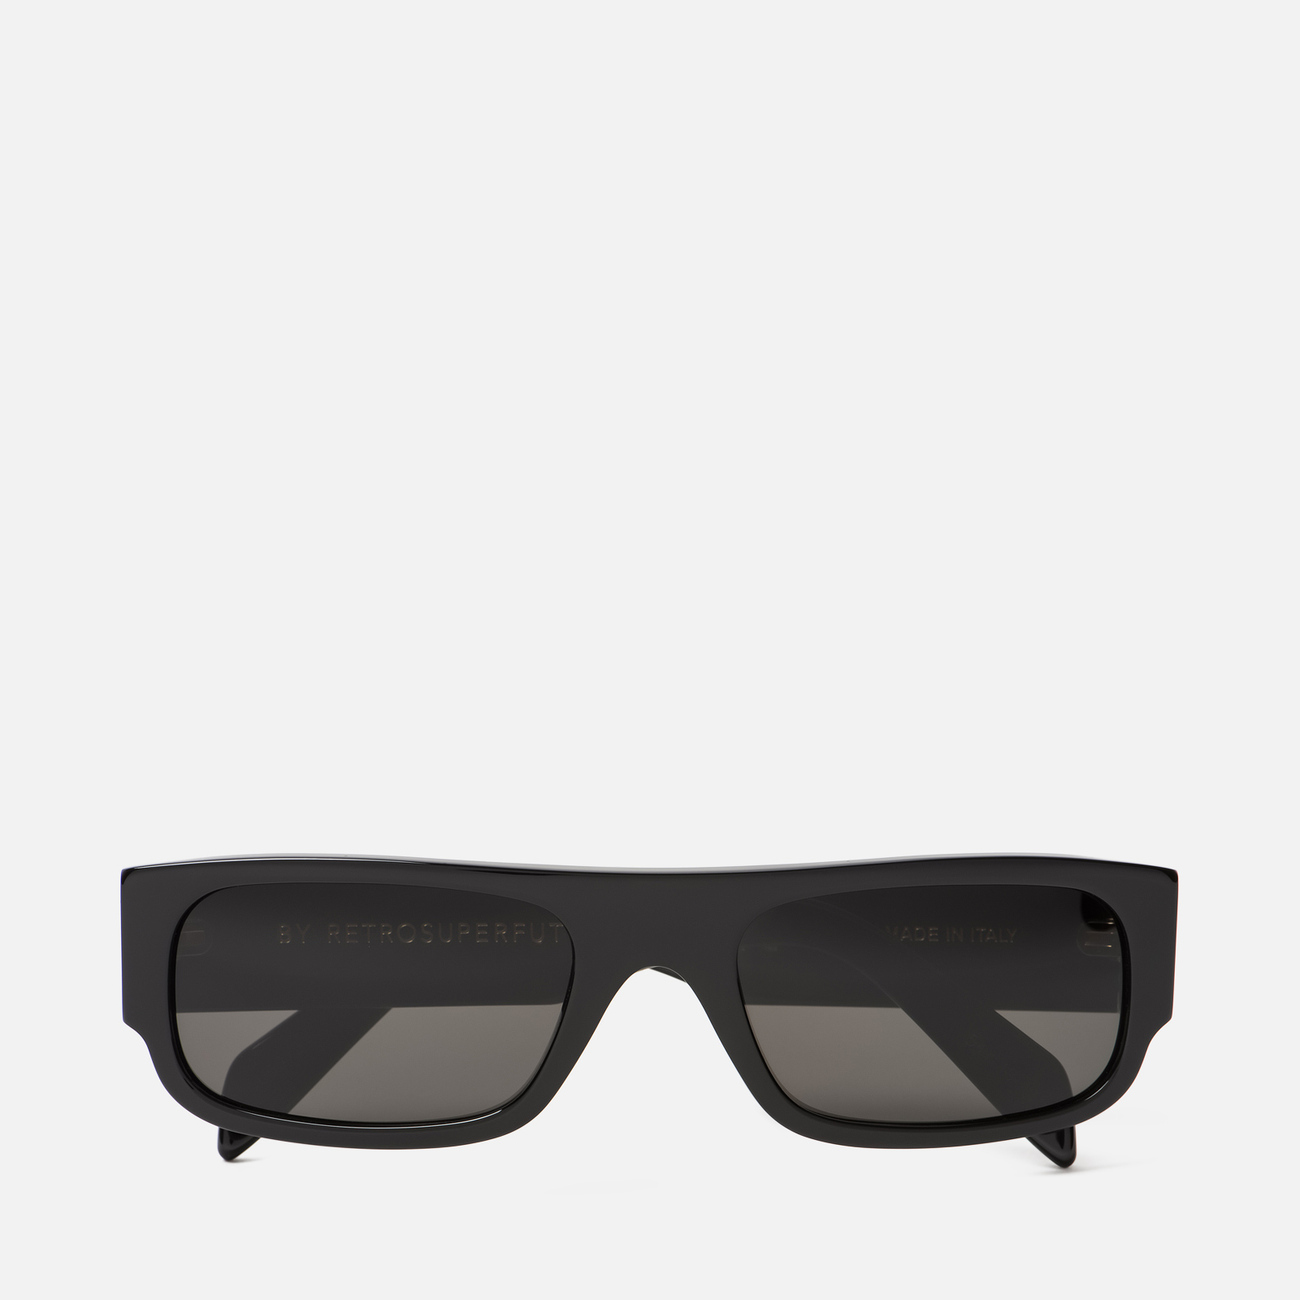 Солнцезащитные очки RETROSUPERFUTURE Smile Black 54